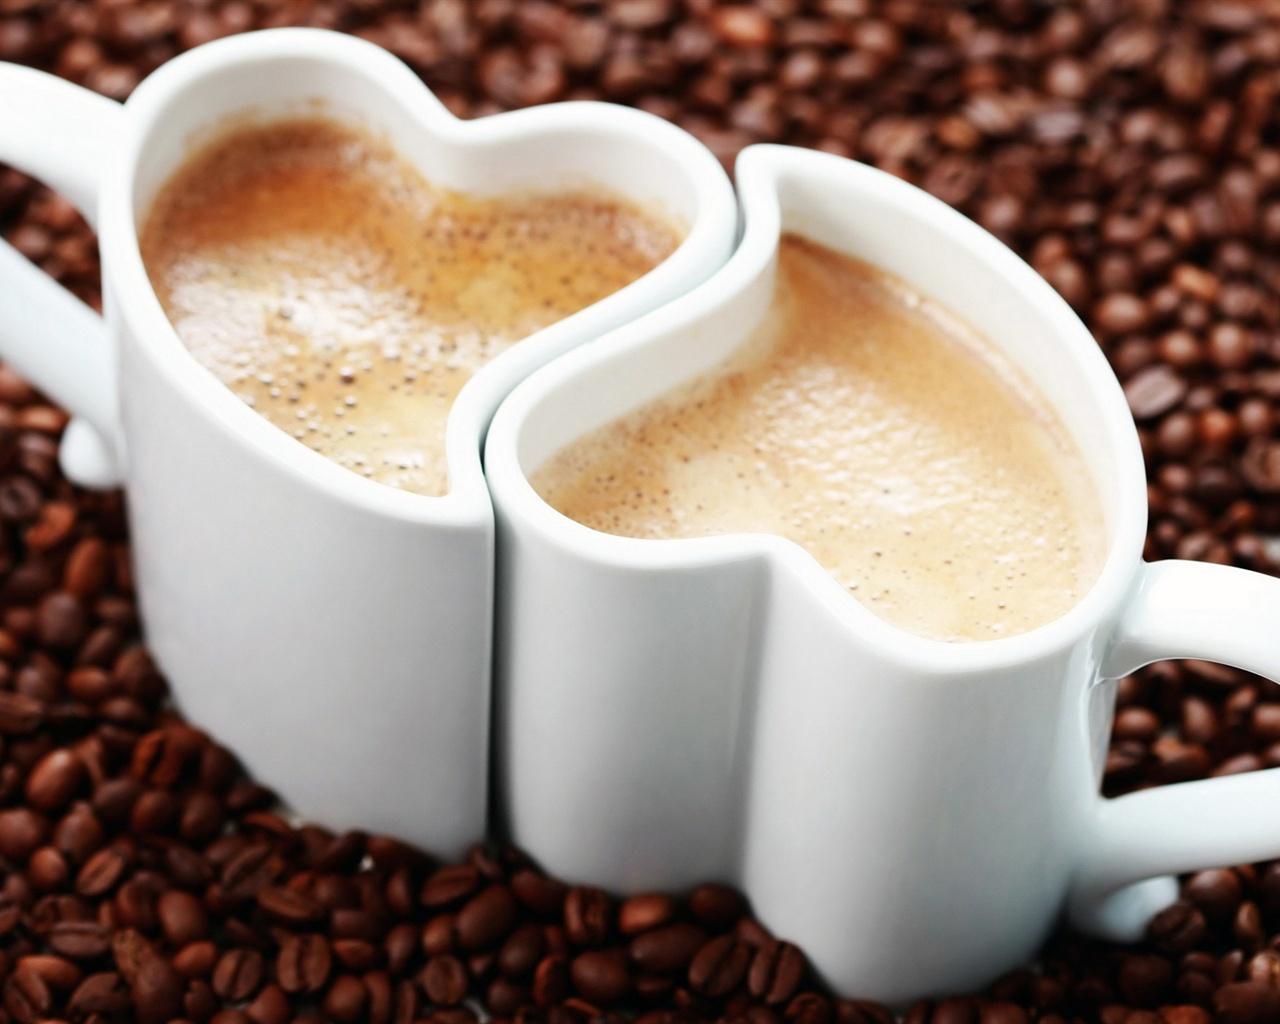 Wallpaper Love Heart Mugs Cappuccino Coffee Coffee